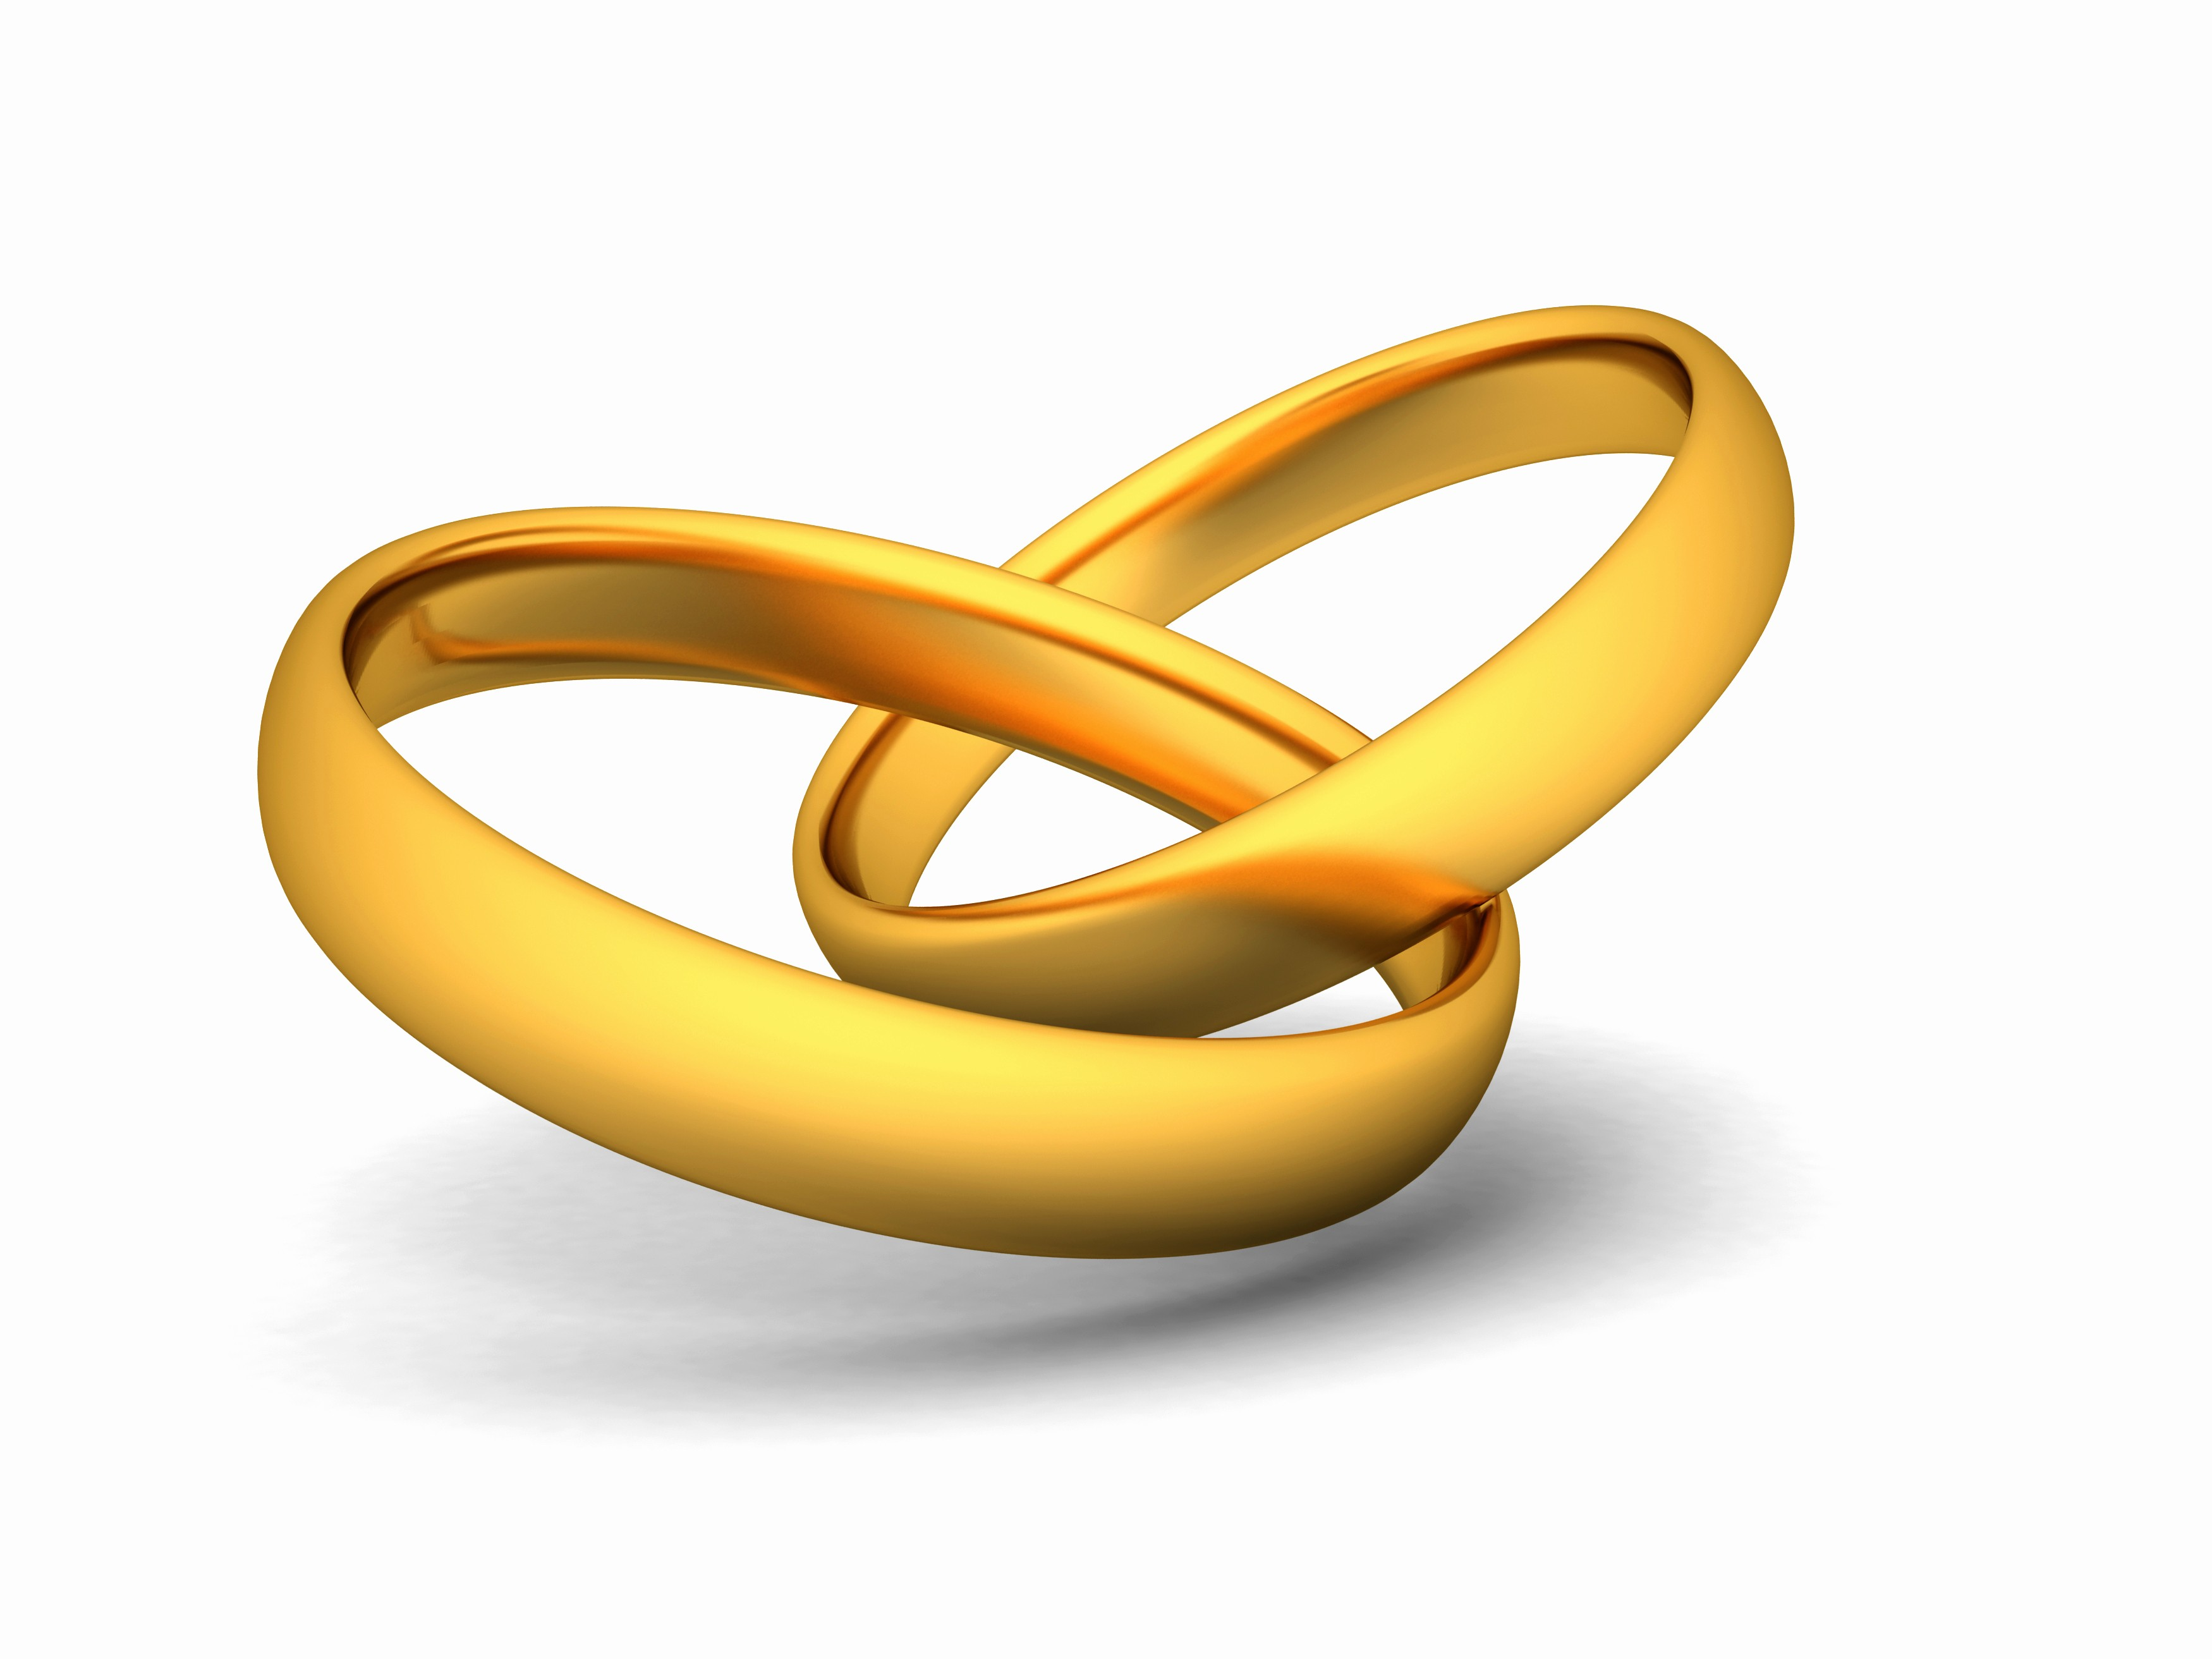 3500x2625 Wedding Ring Clipart Clip Art Botanicus Interactic Adorable